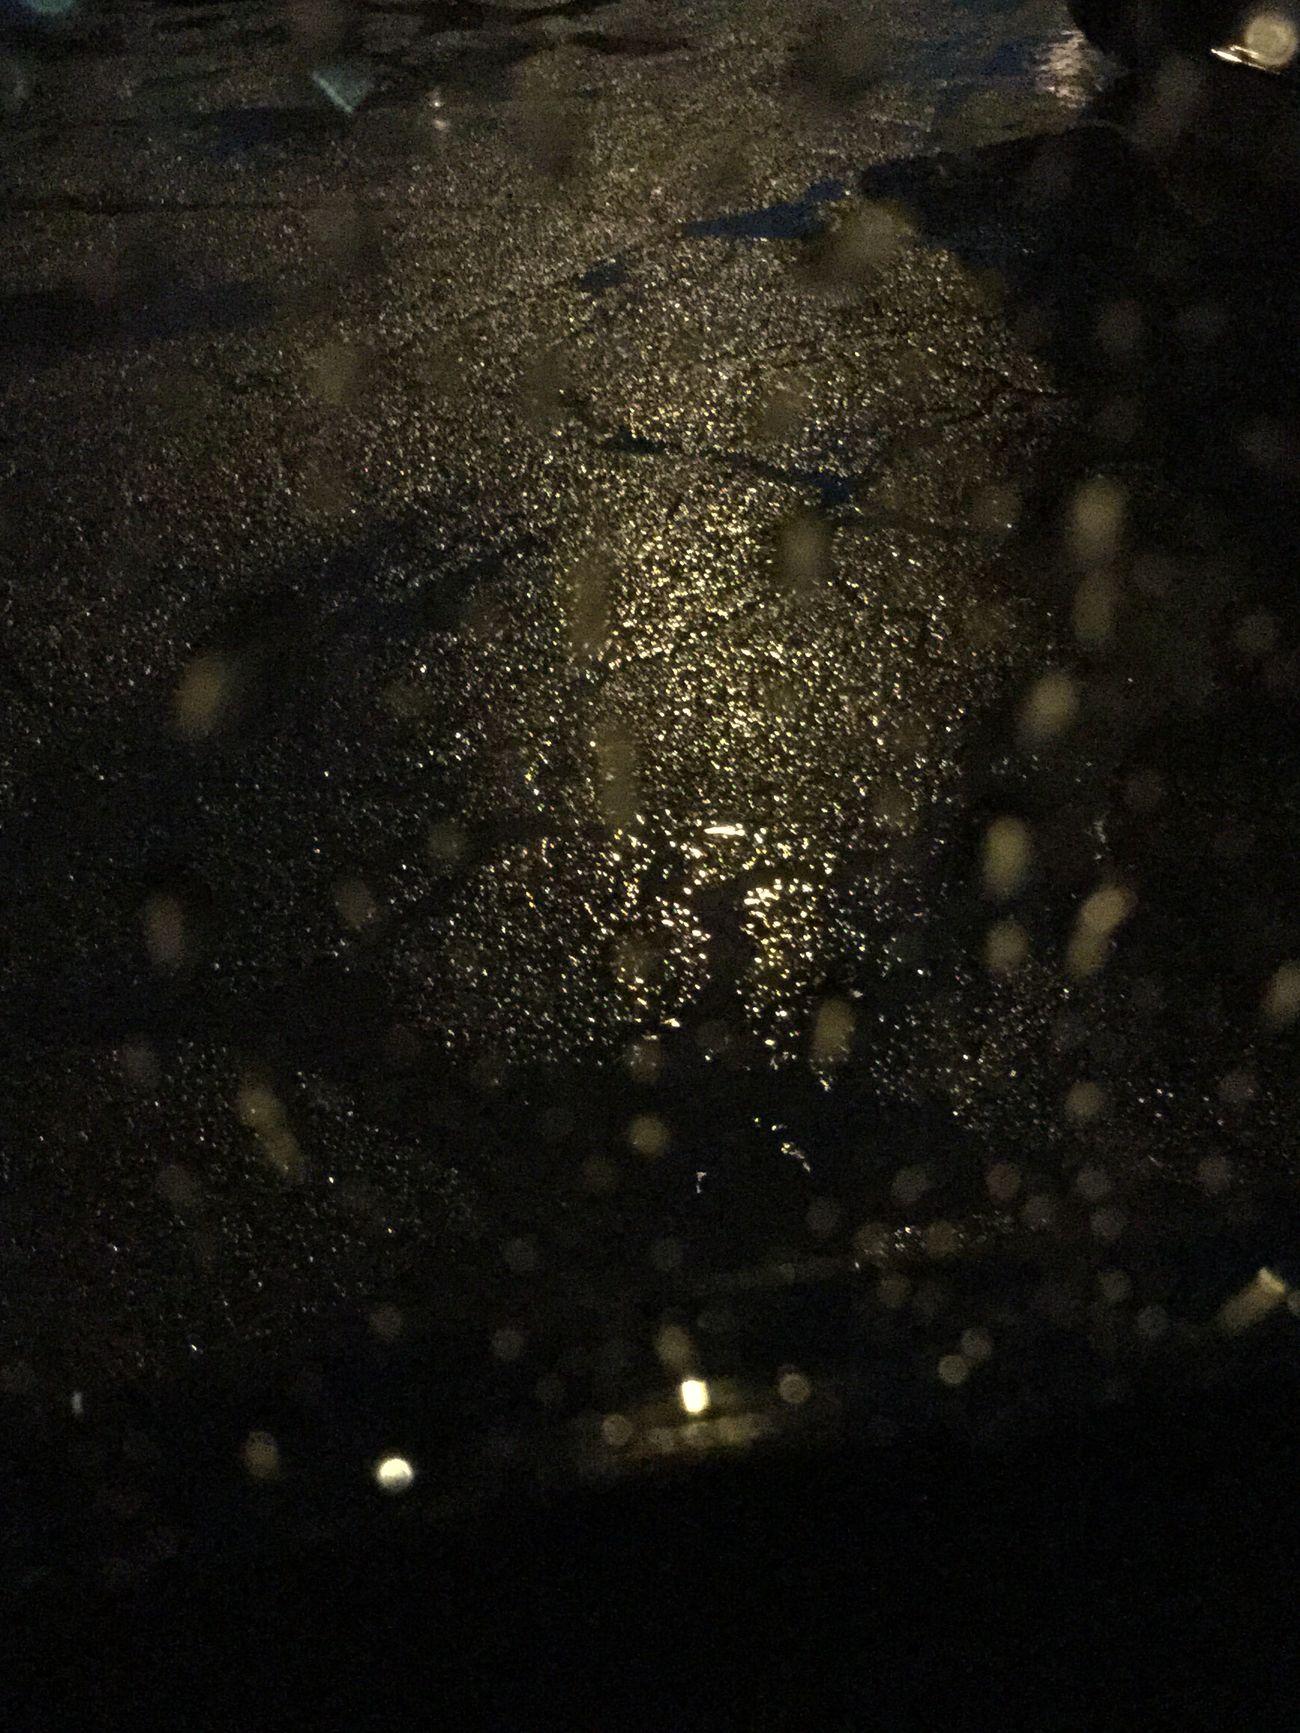 Nofilter Rain Cracksonfloor Kindacreepy Nighttime HASHTAG Raindrops Litttlepuddle